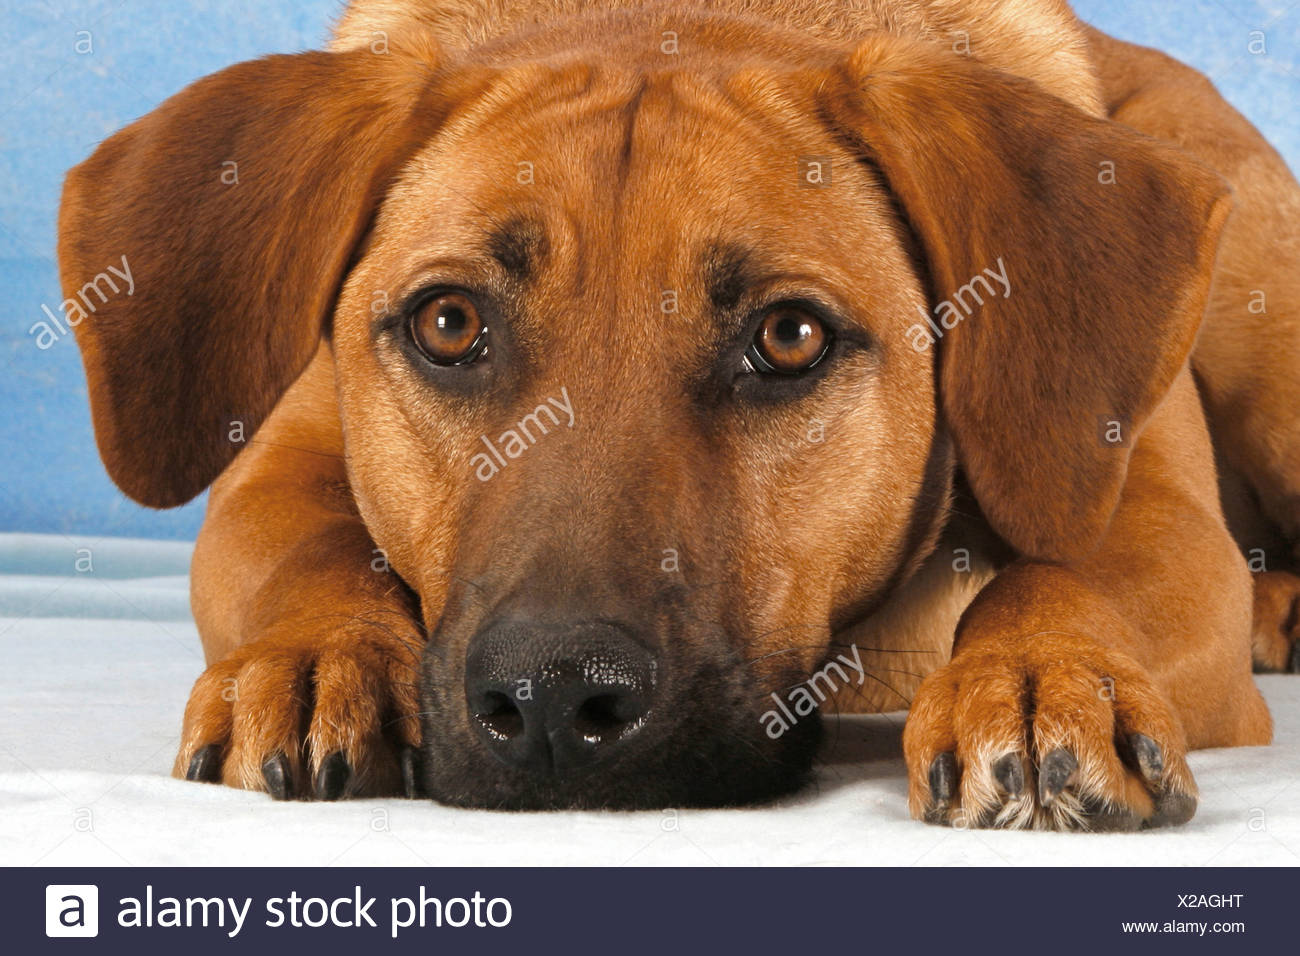 half breed dog - lying - Stock Image